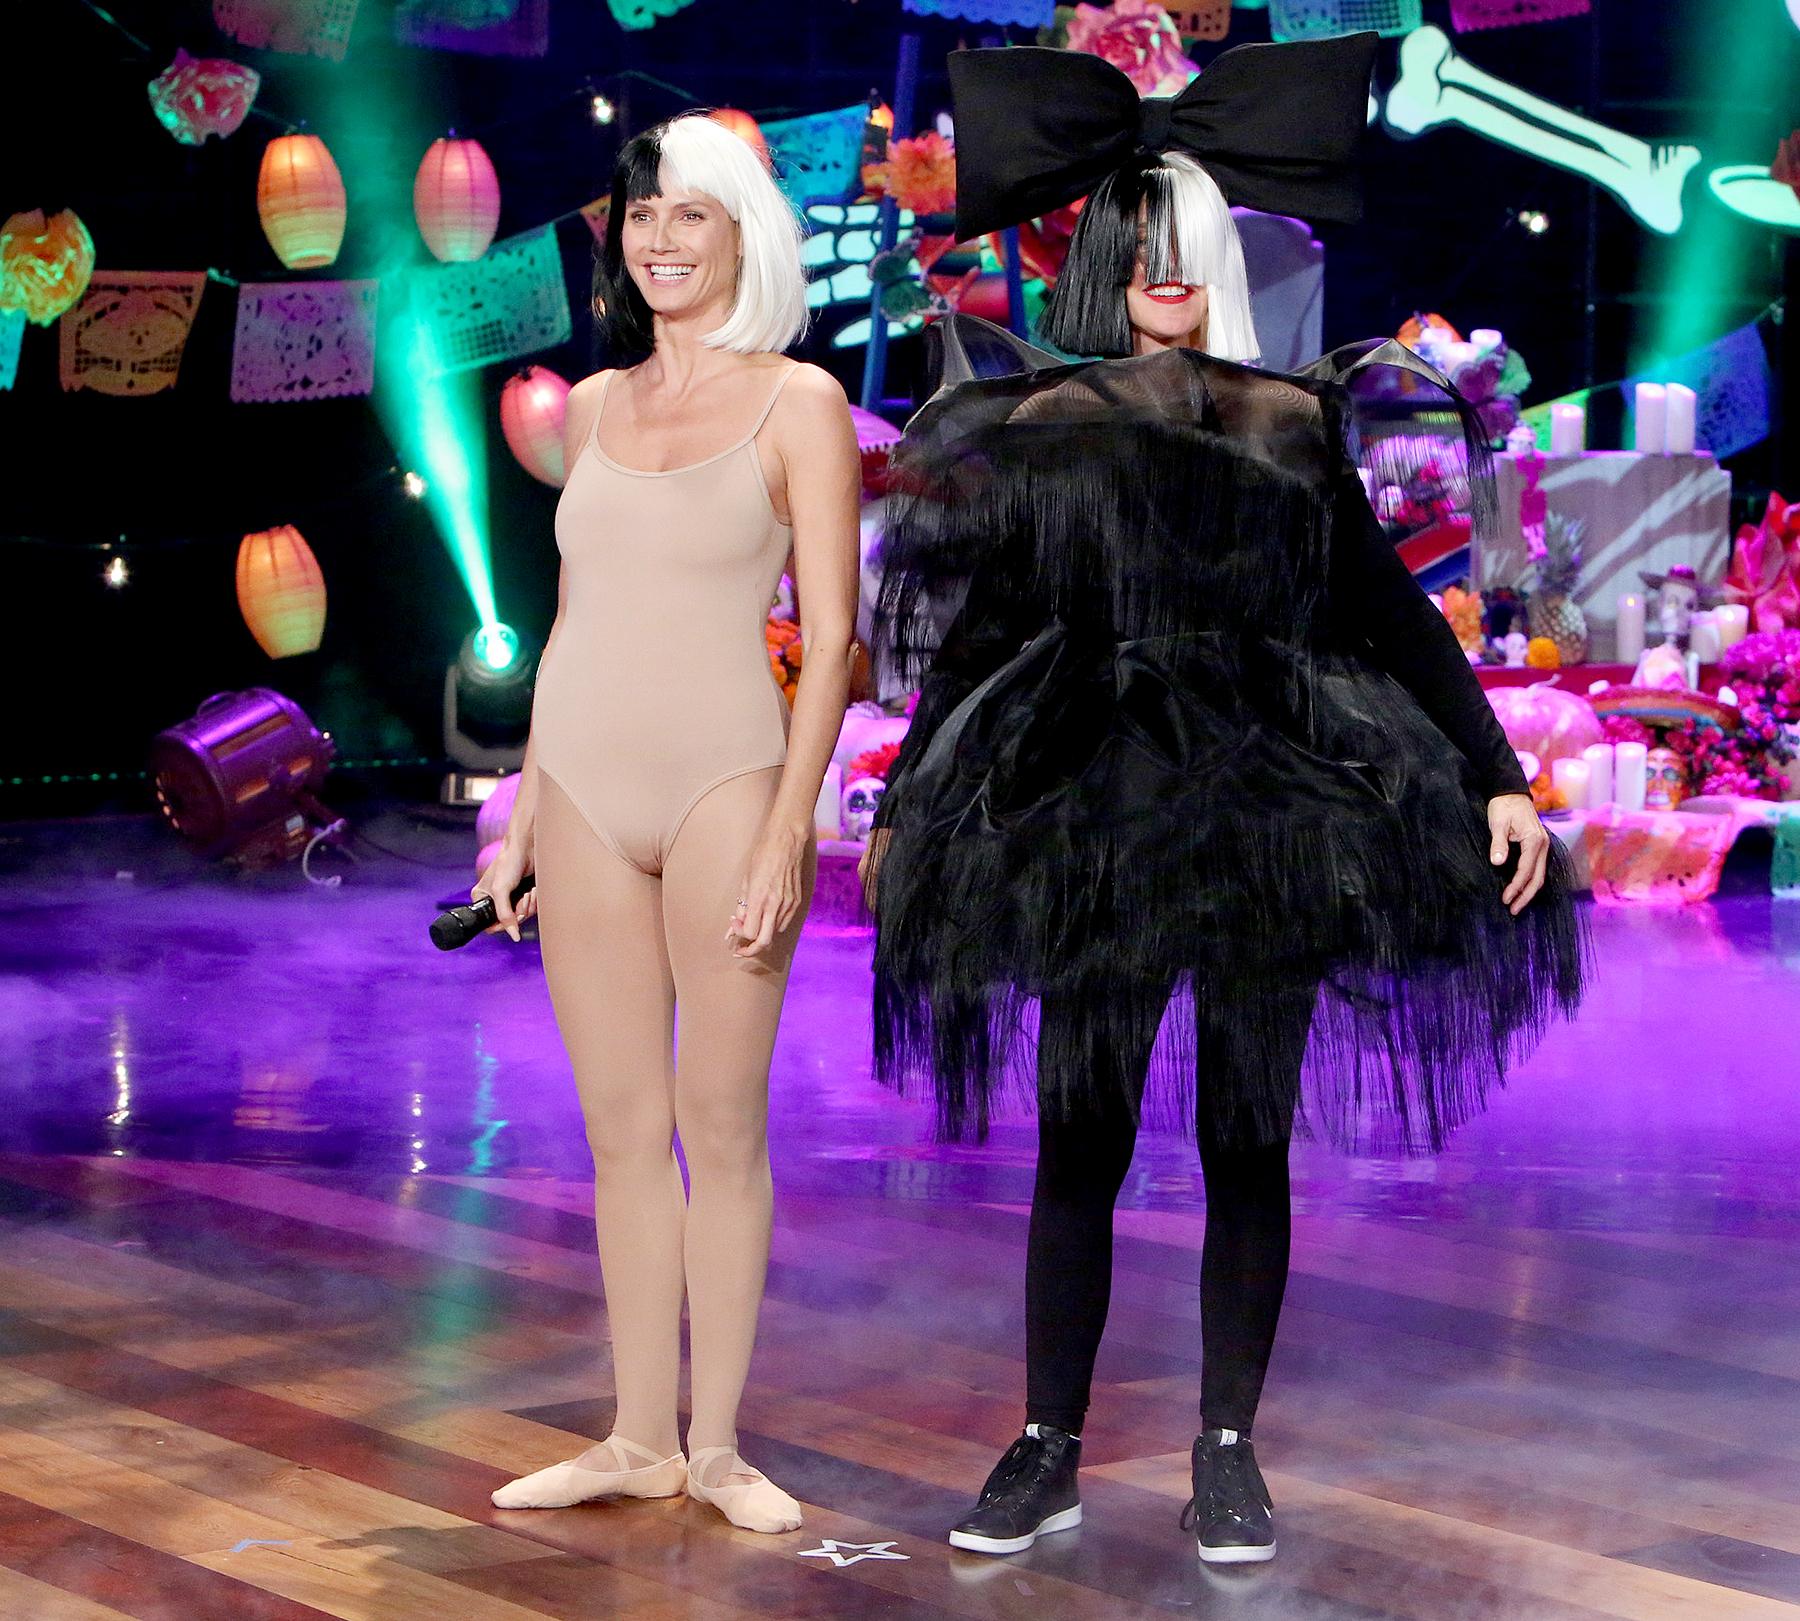 Heidi Klum and Ellen DeGeneres dressed up as Maddie Ziegler and Sia.